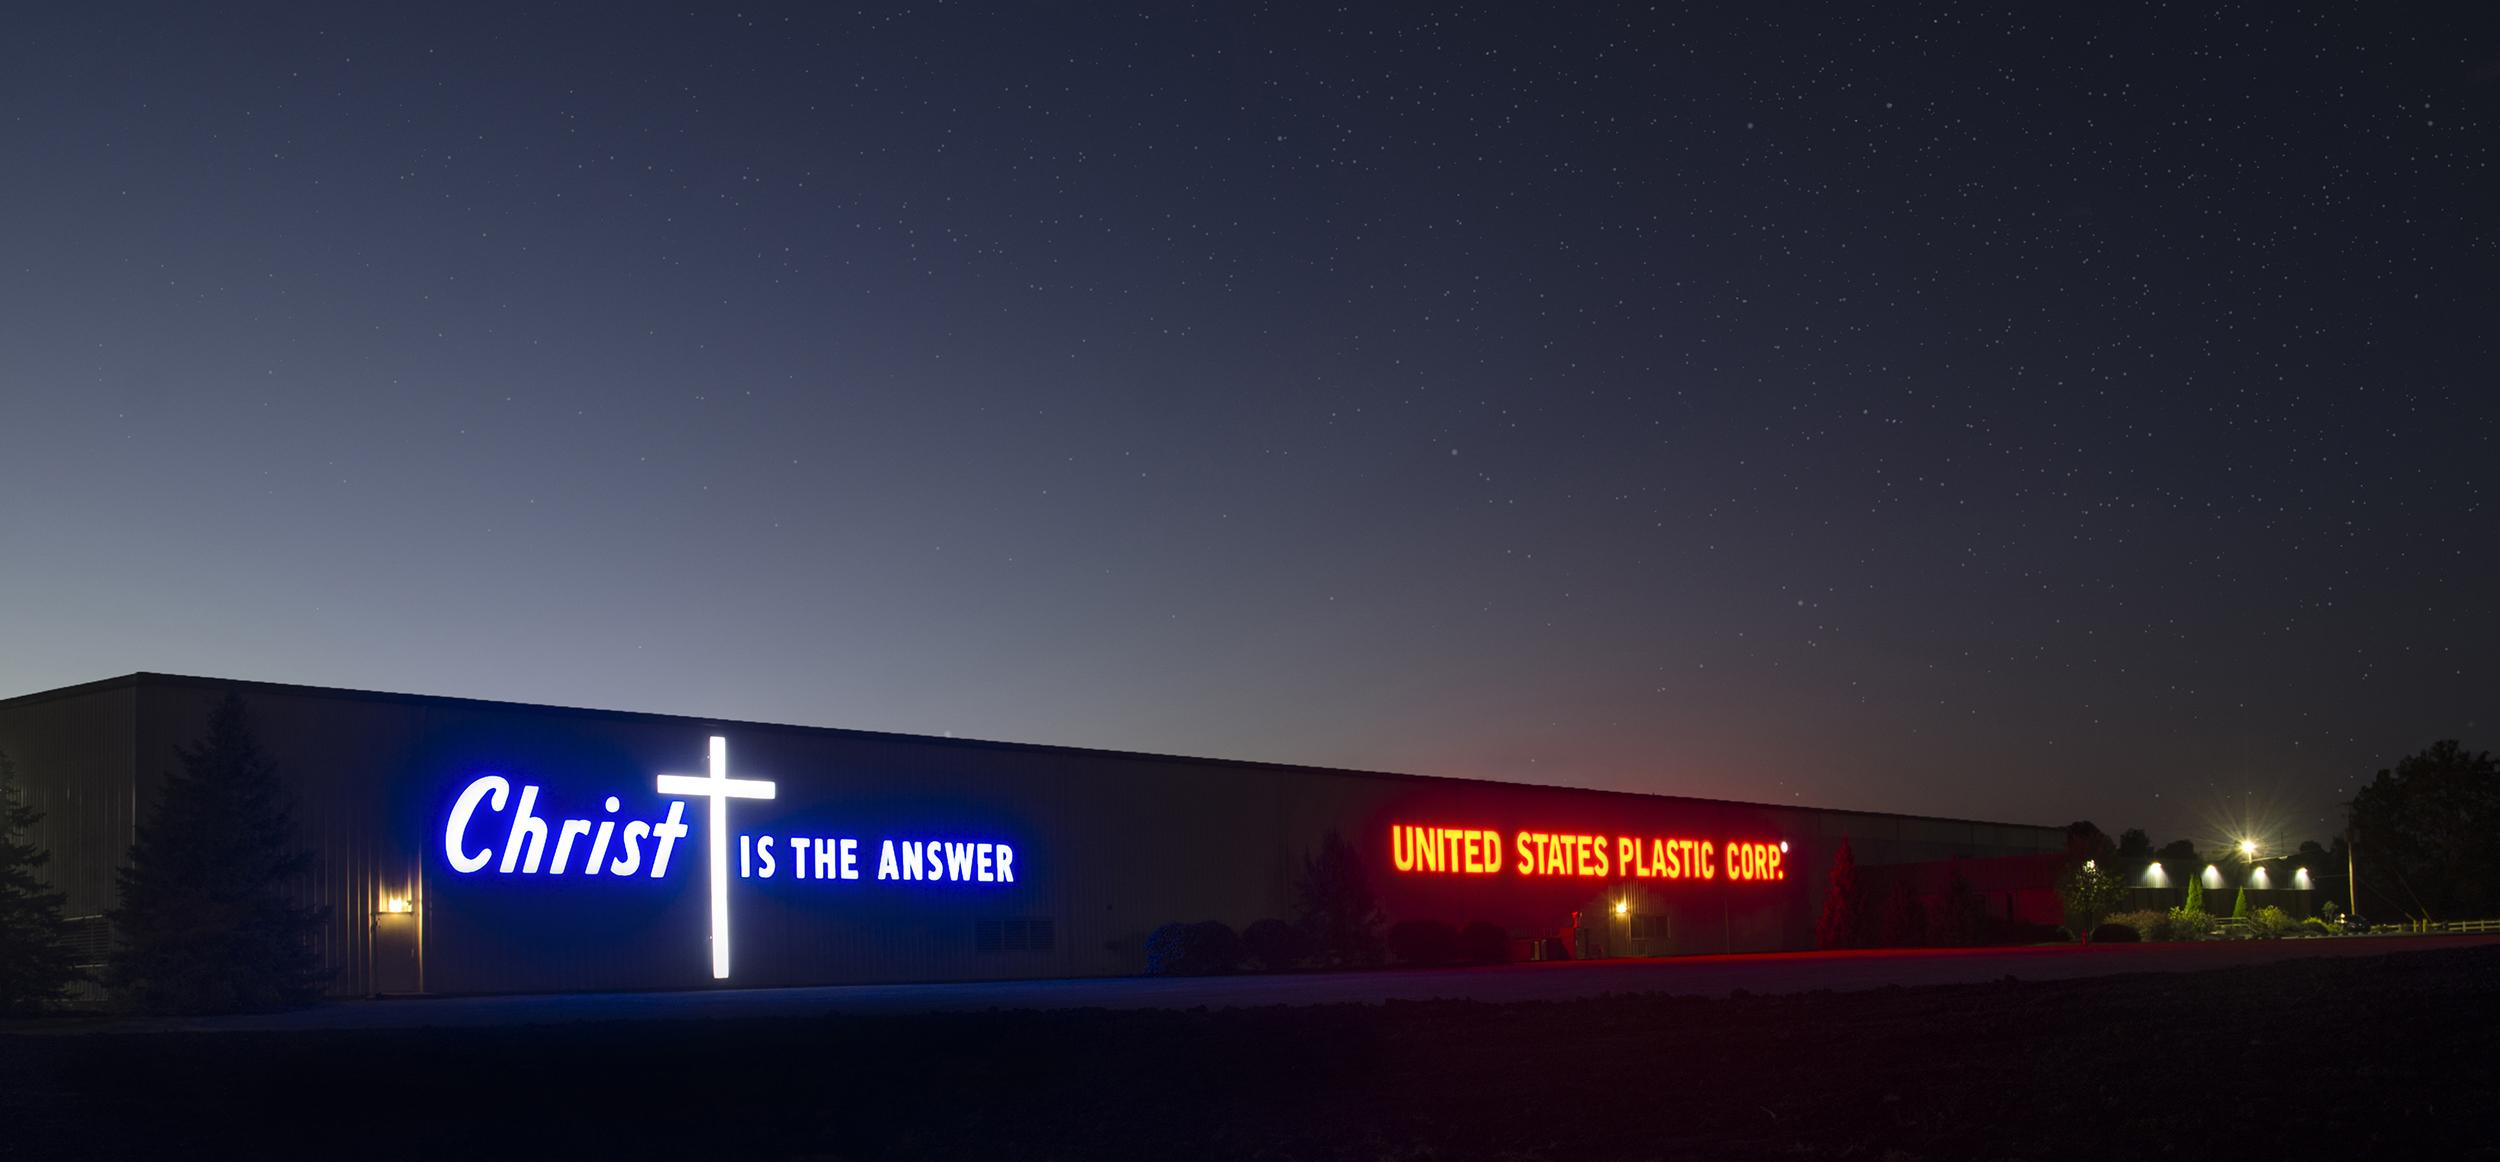 U.S. Plastic building at night